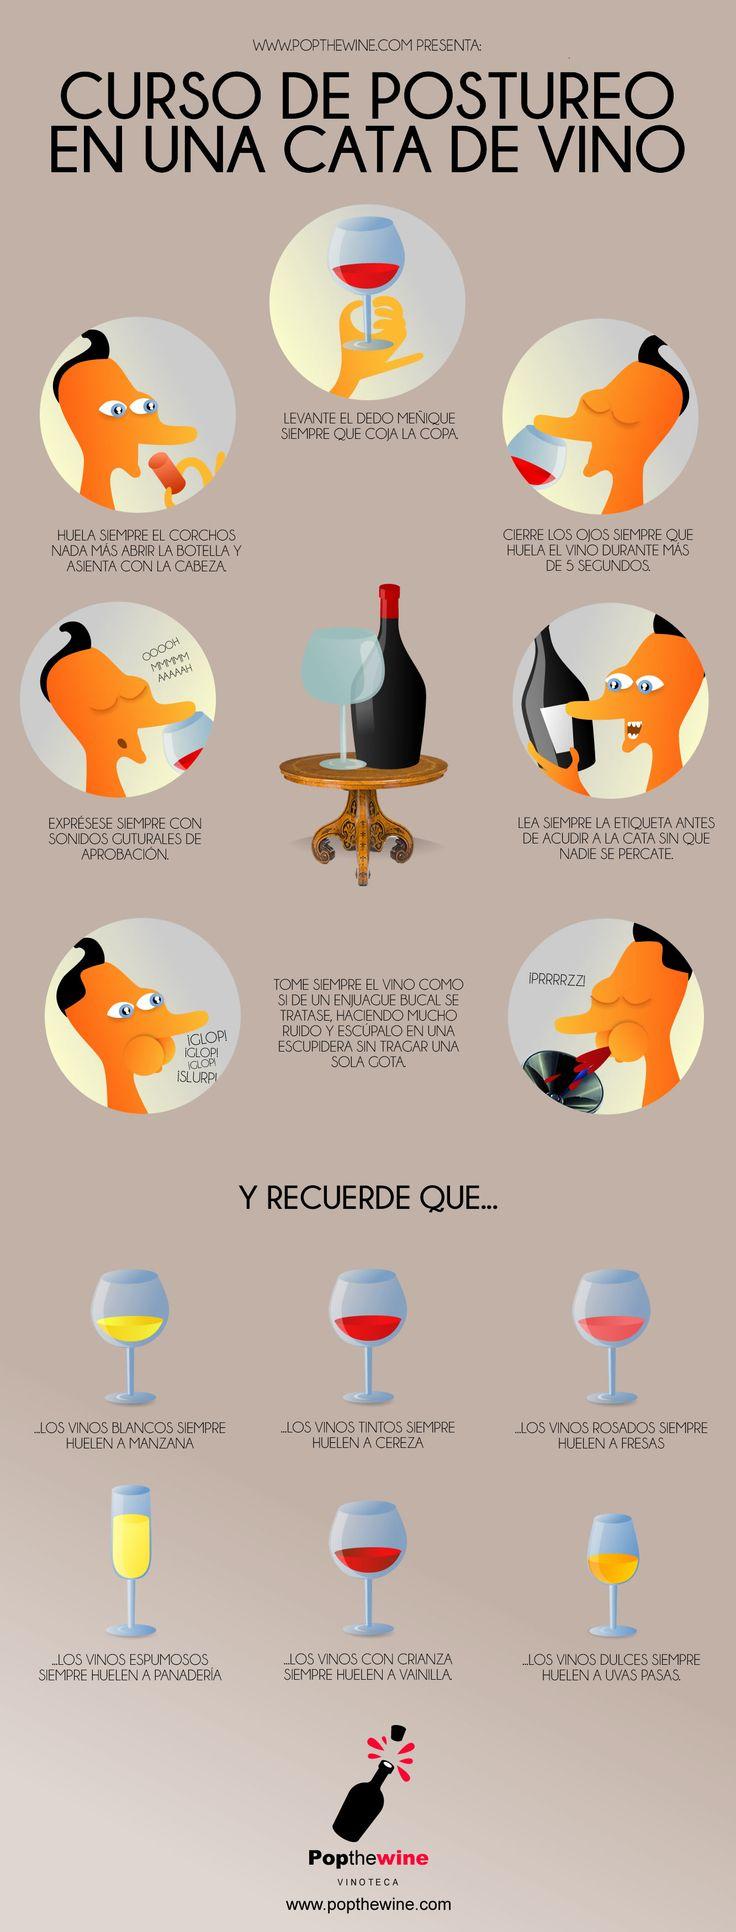 Curso de postureo en una cata de #vino: https://popthewine.wordpress.com/2016/01/19/curso-de-postureo-en-una-cata-de-vino/ .x.r.